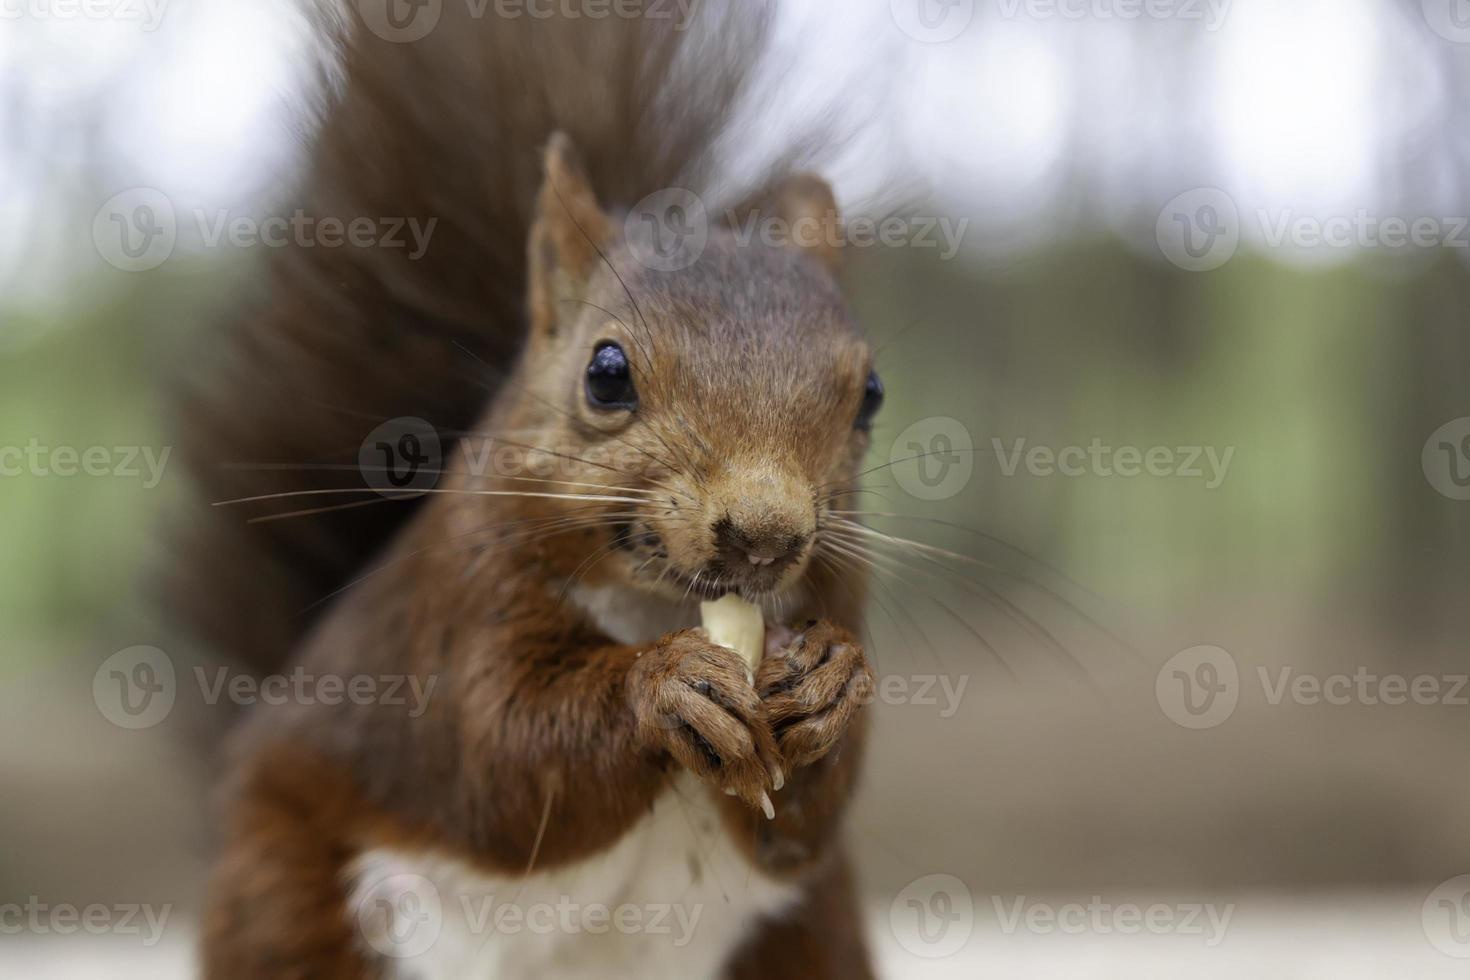 Squirrel eating peanuts photo